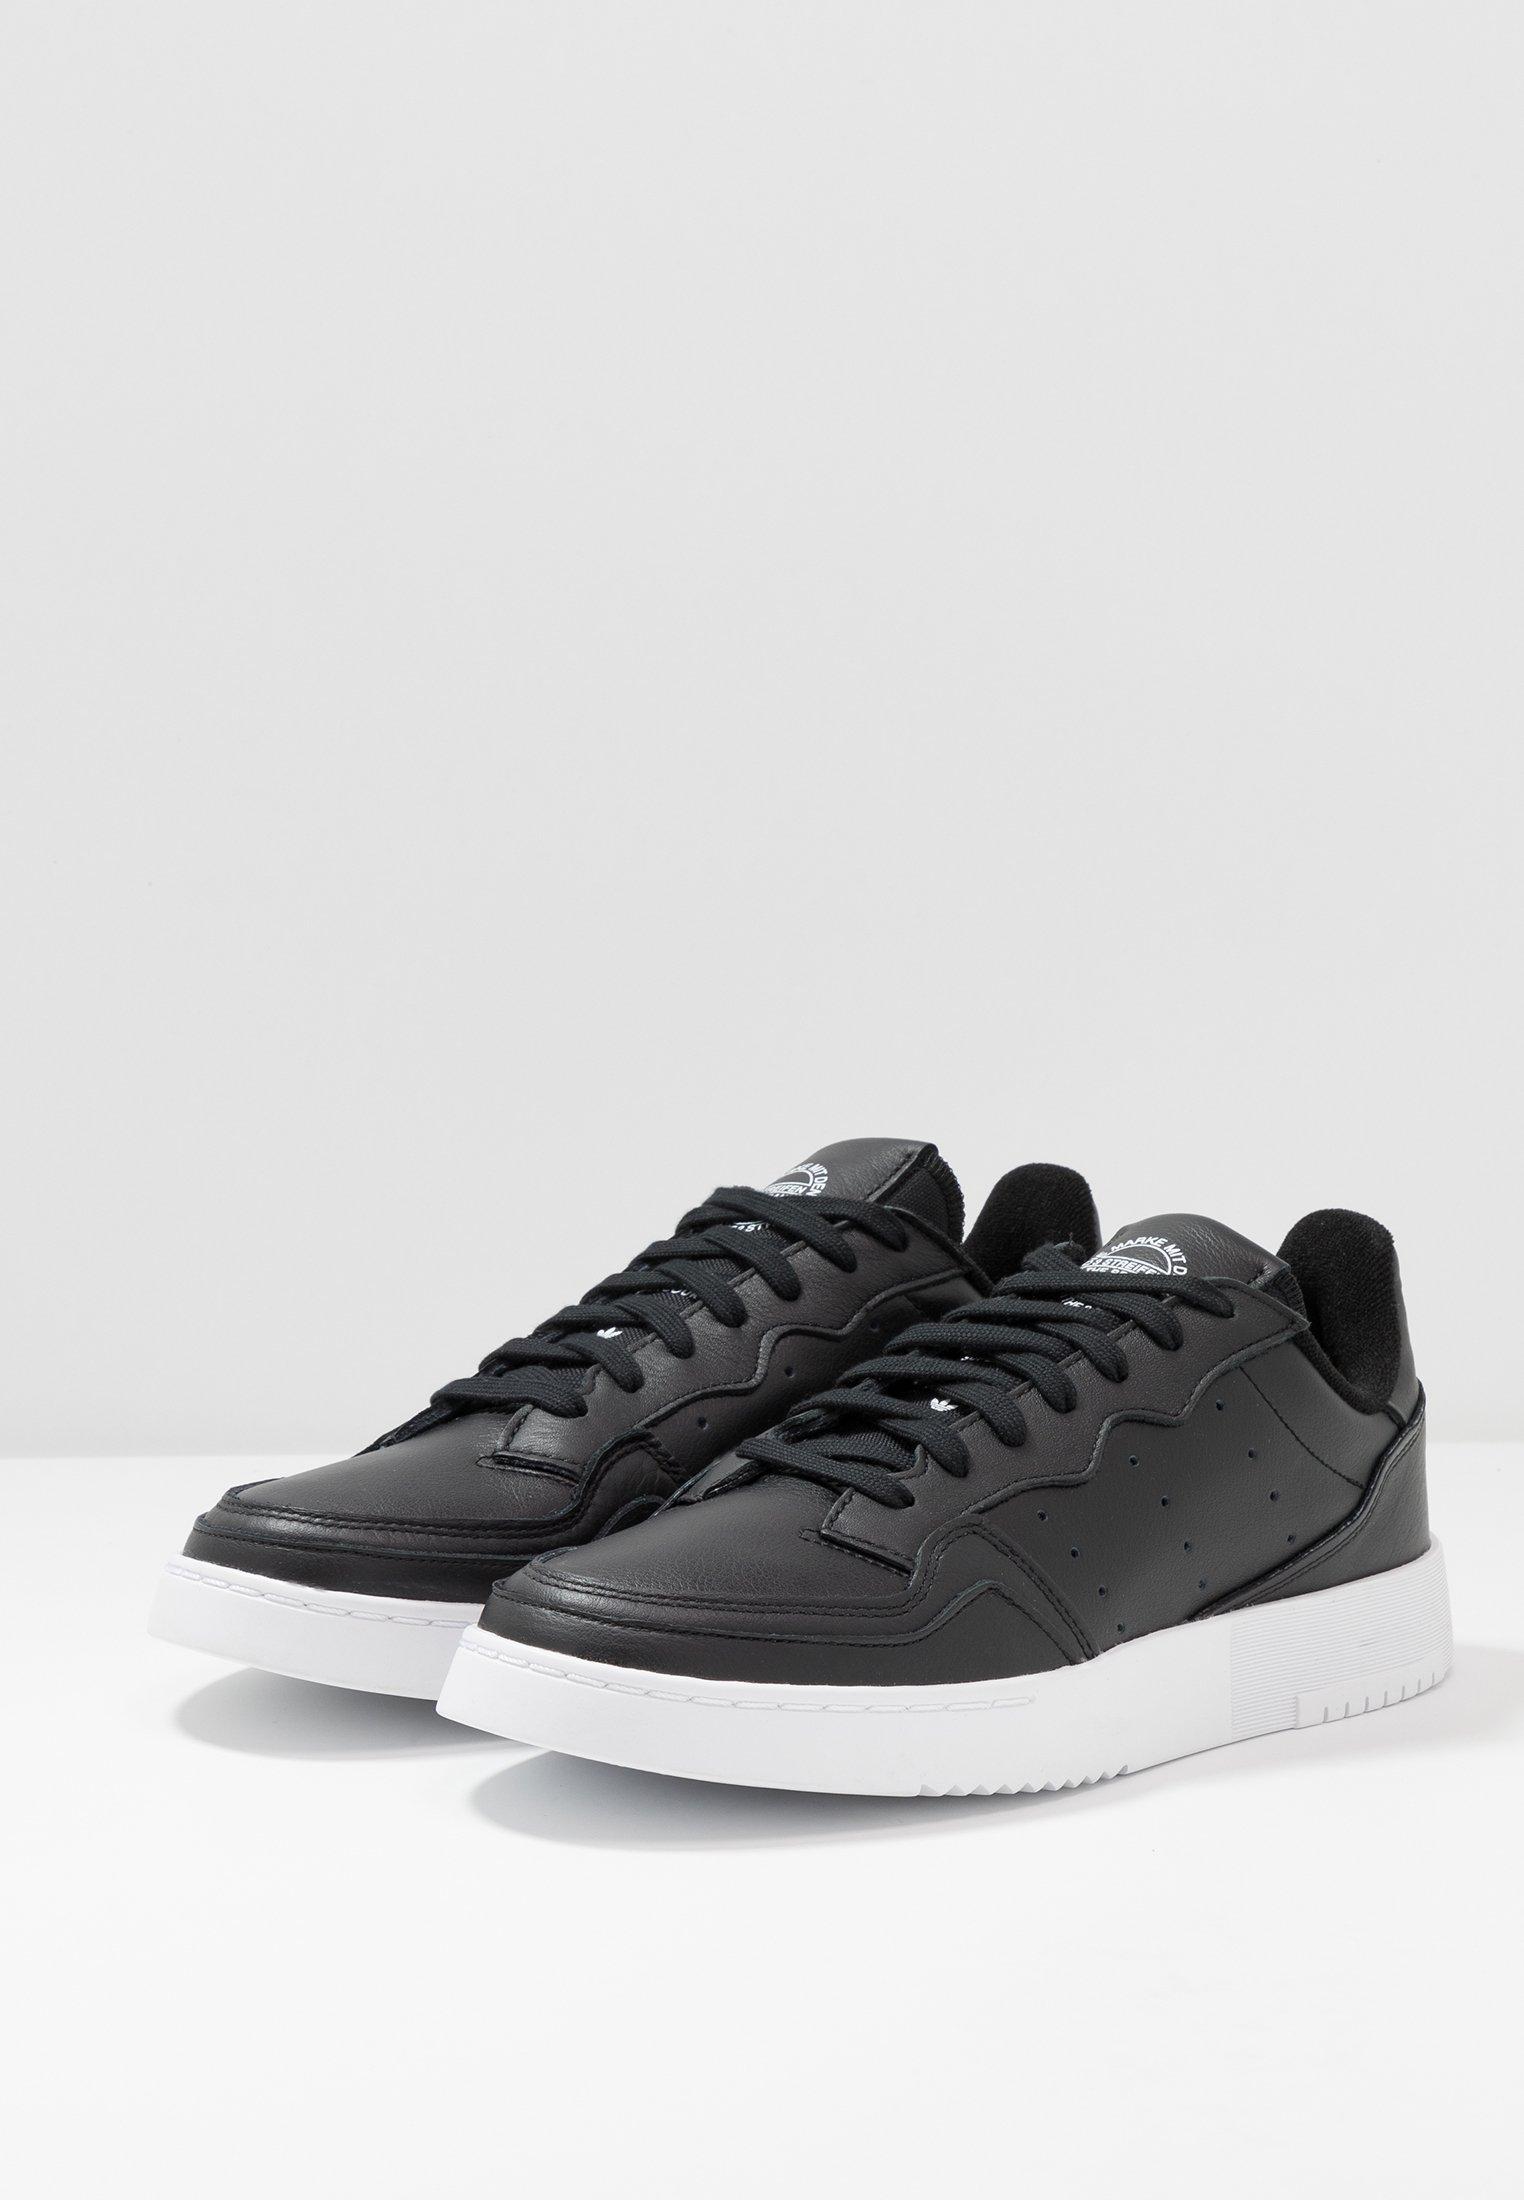 adidas Originals SUPERCOURT - Sneaker low - cblack/cblack/ftwwht/schwarz - Herrenschuhe fdBAw